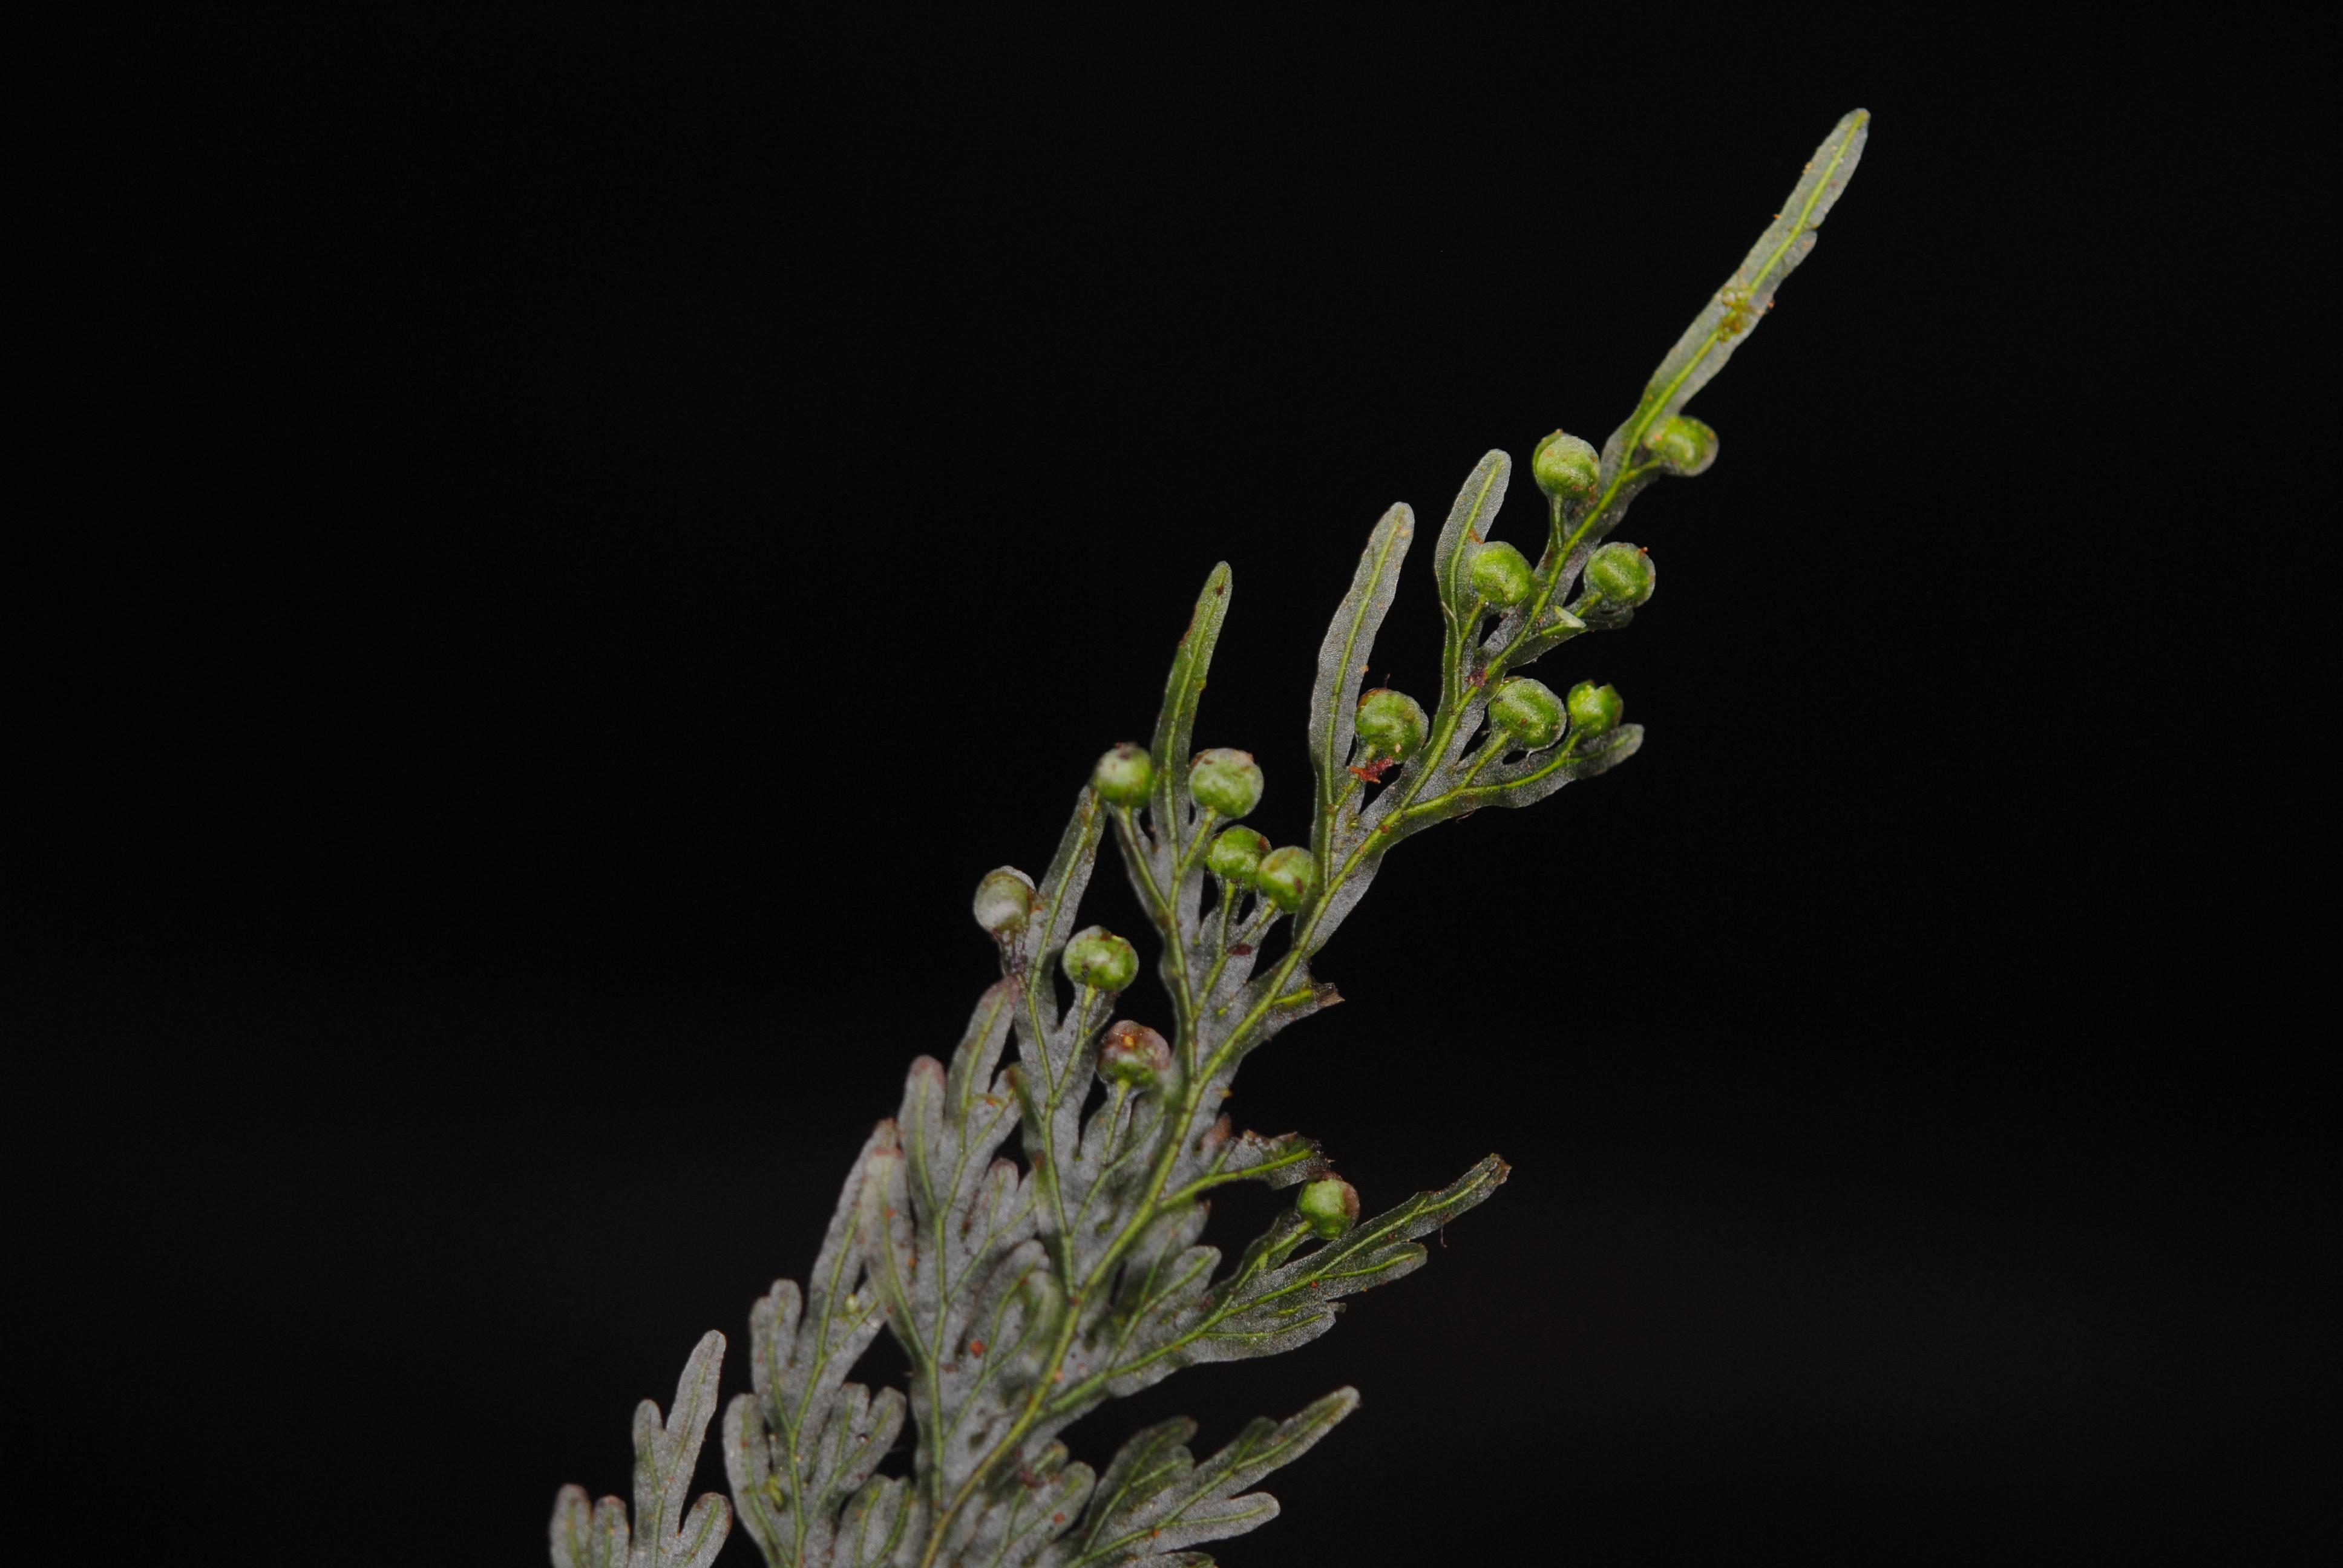 Hymenophyllum imbricatum